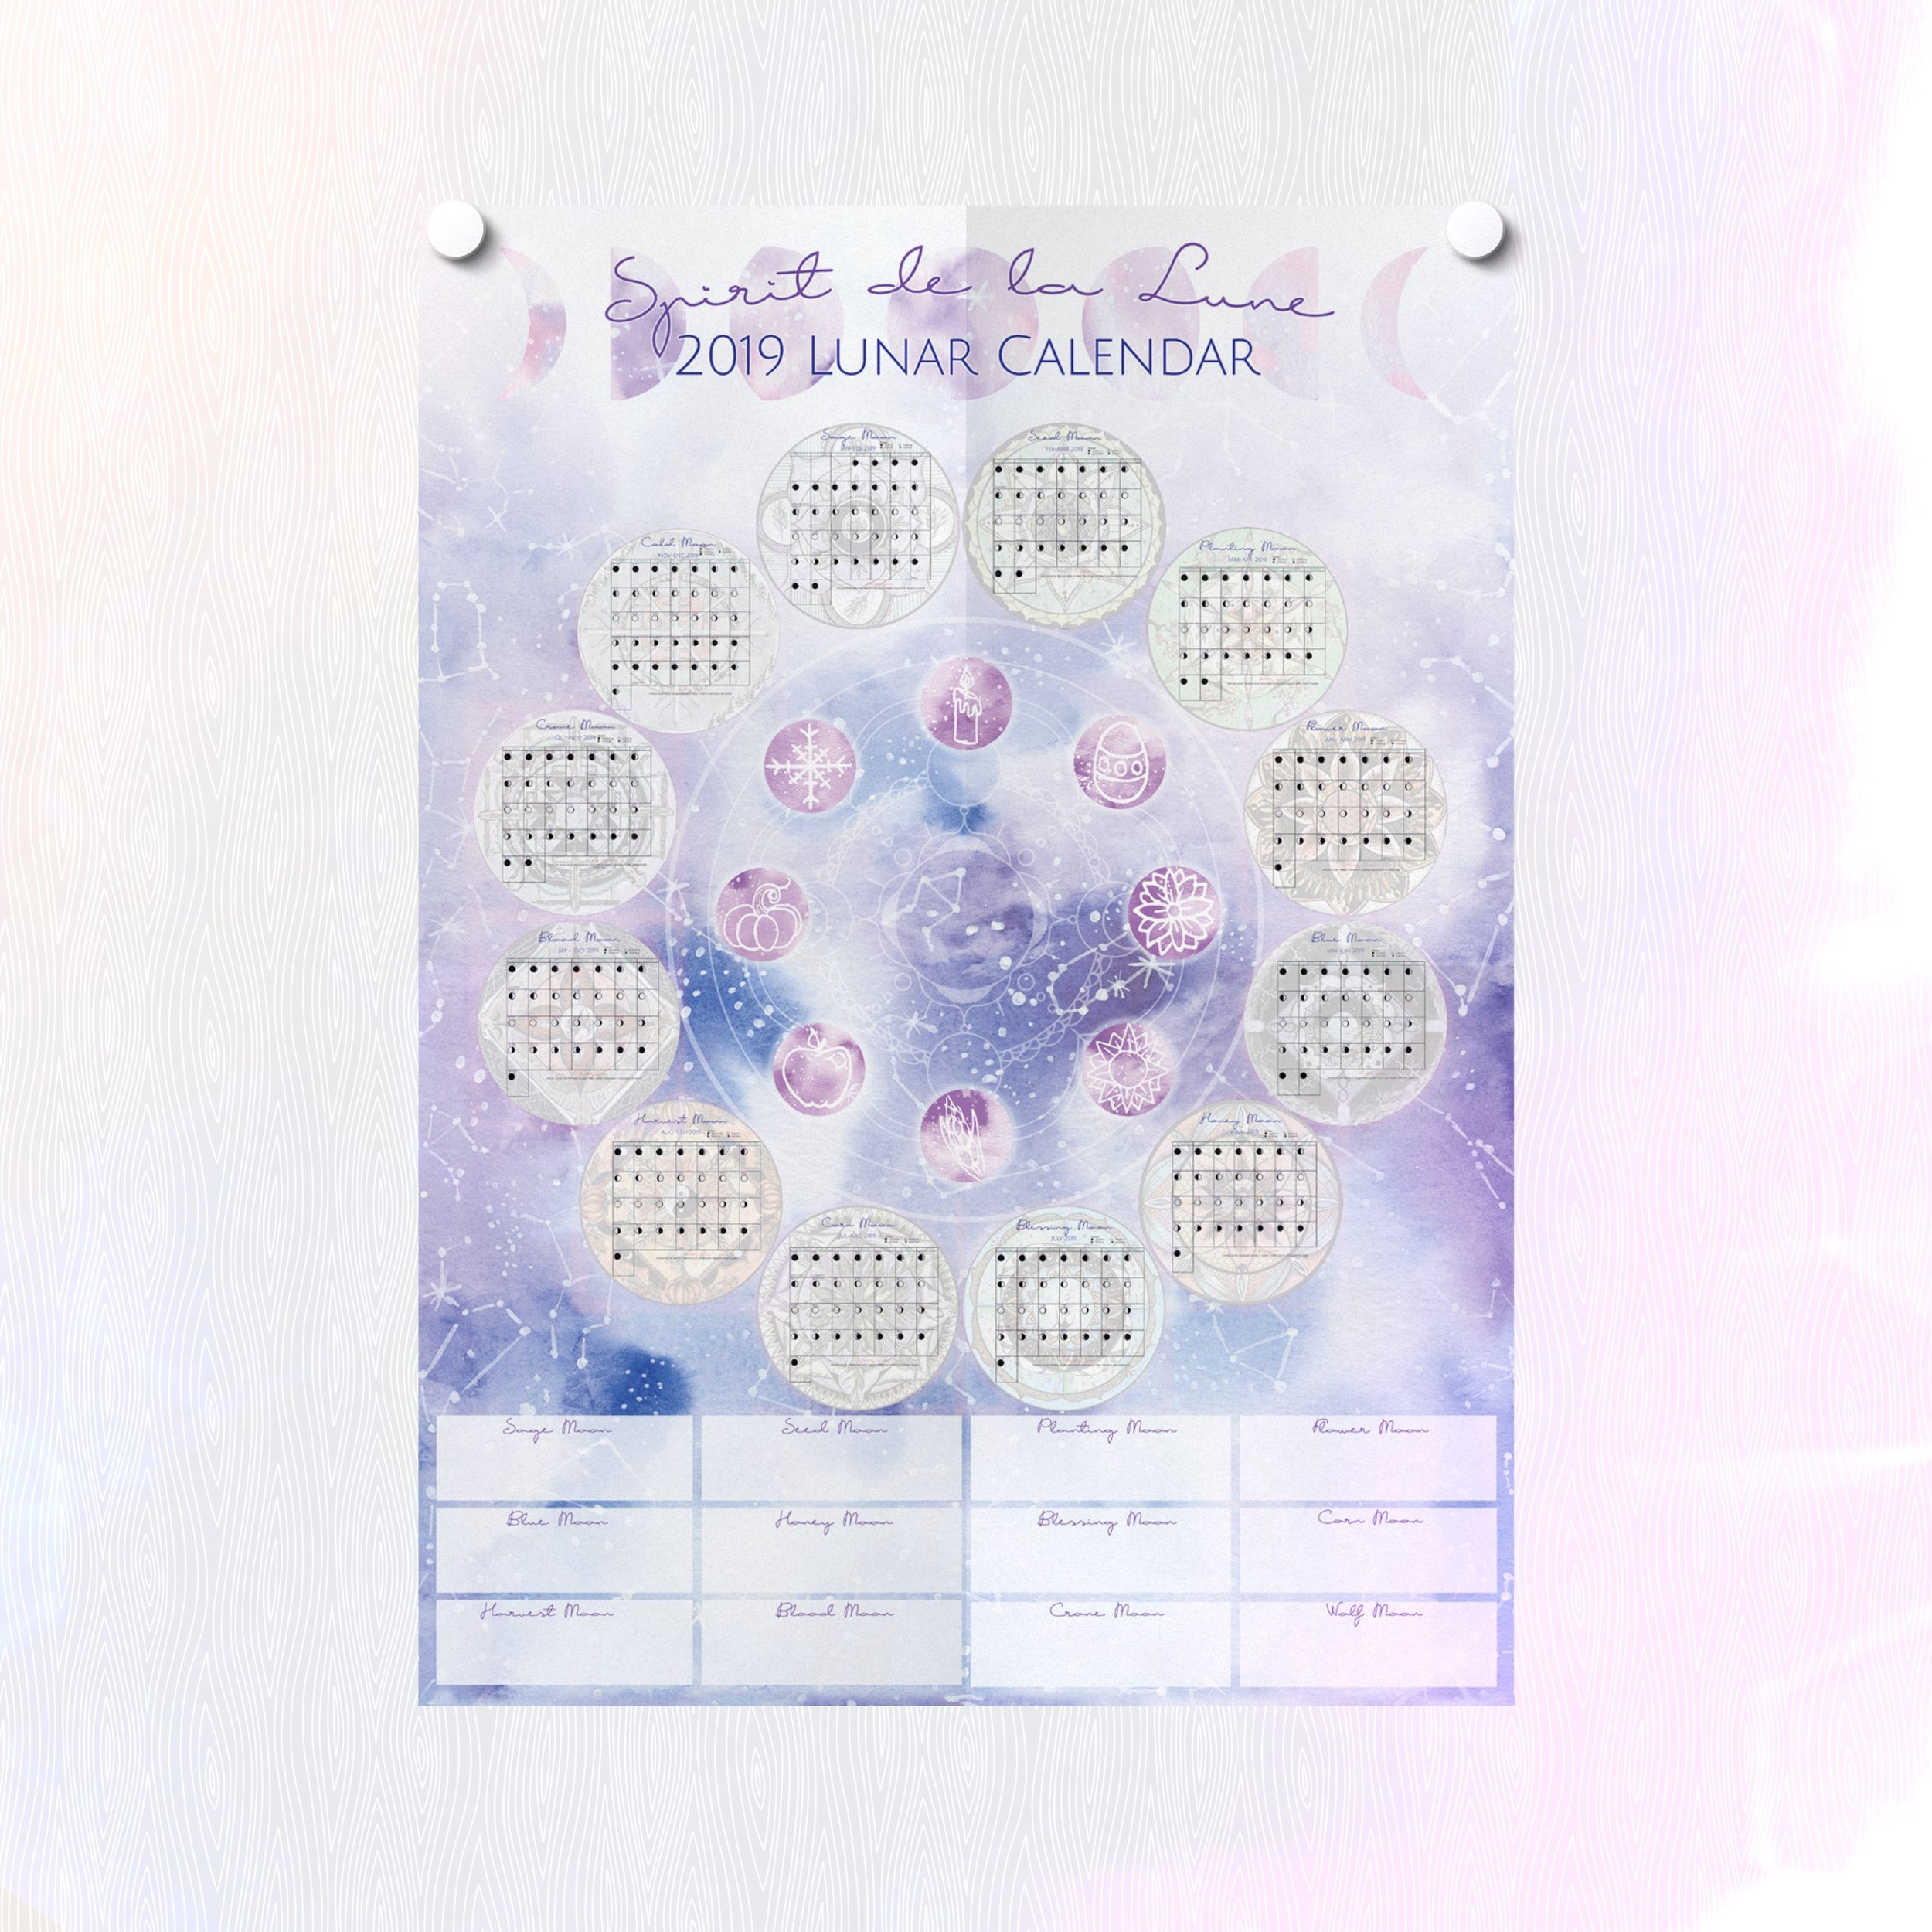 Spirit de la lune 2019 tune to the moon planner